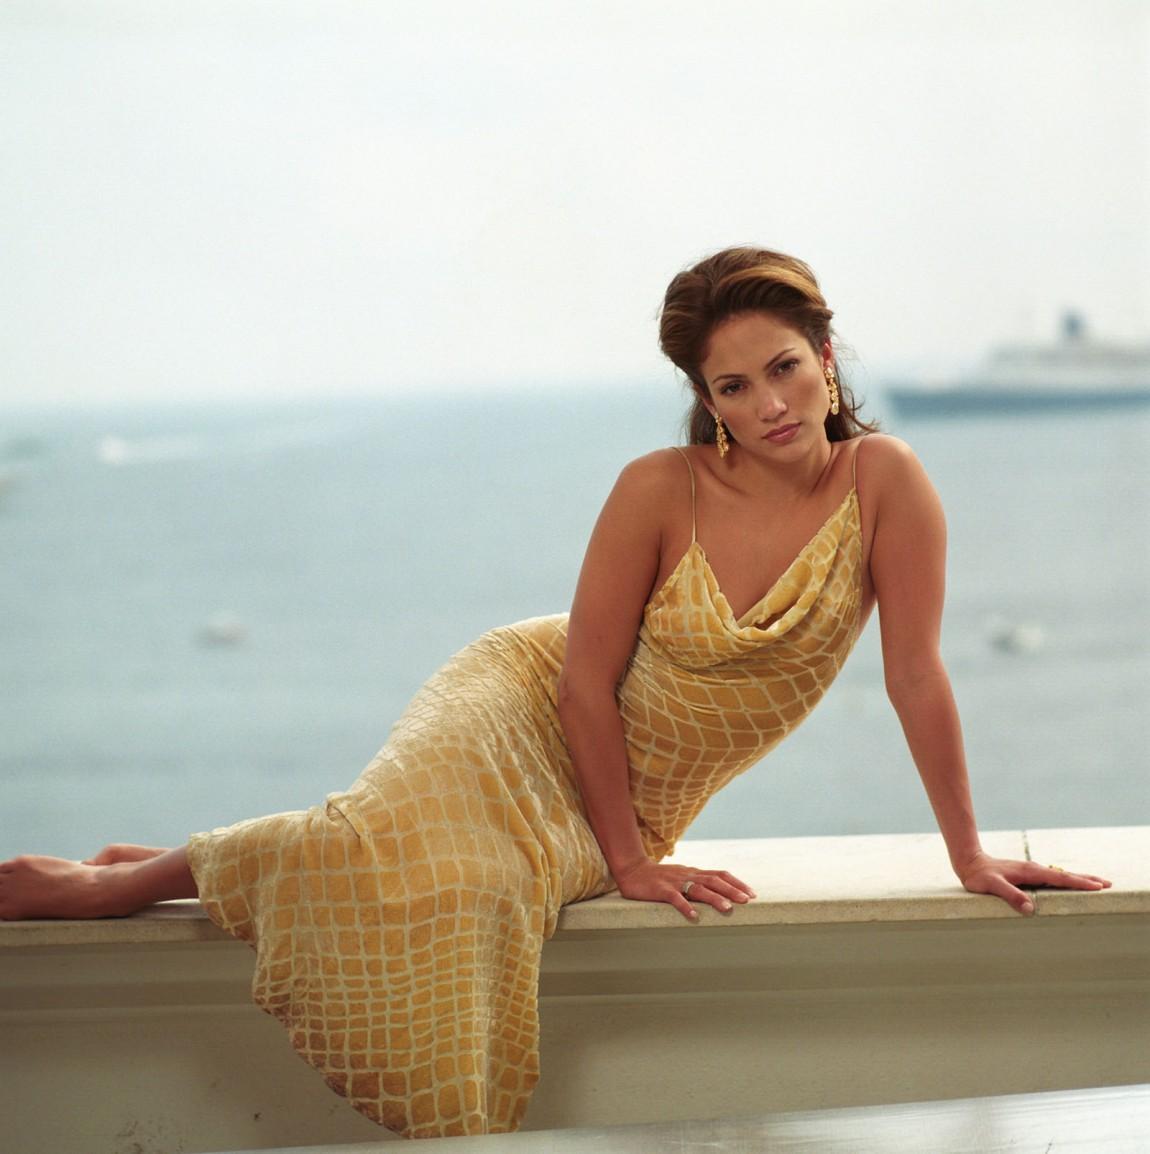 Any movies similar to ENOUGH w/ J.Lo?